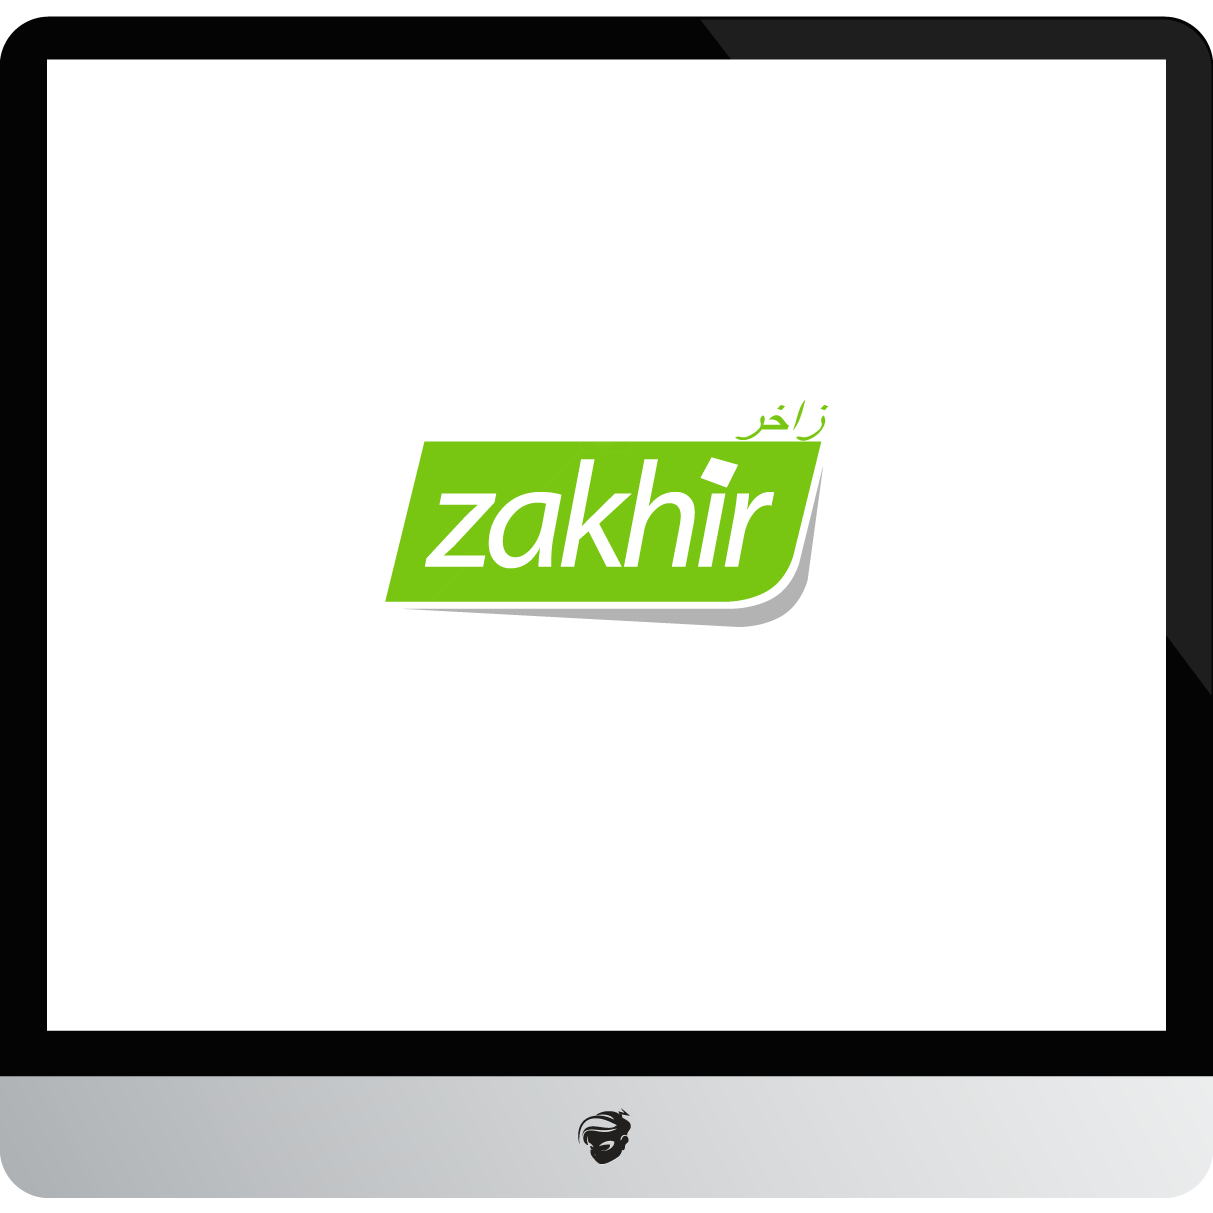 Logo Design by zesthar - Entry No. 96 in the Logo Design Contest Zakhir Logo Design.